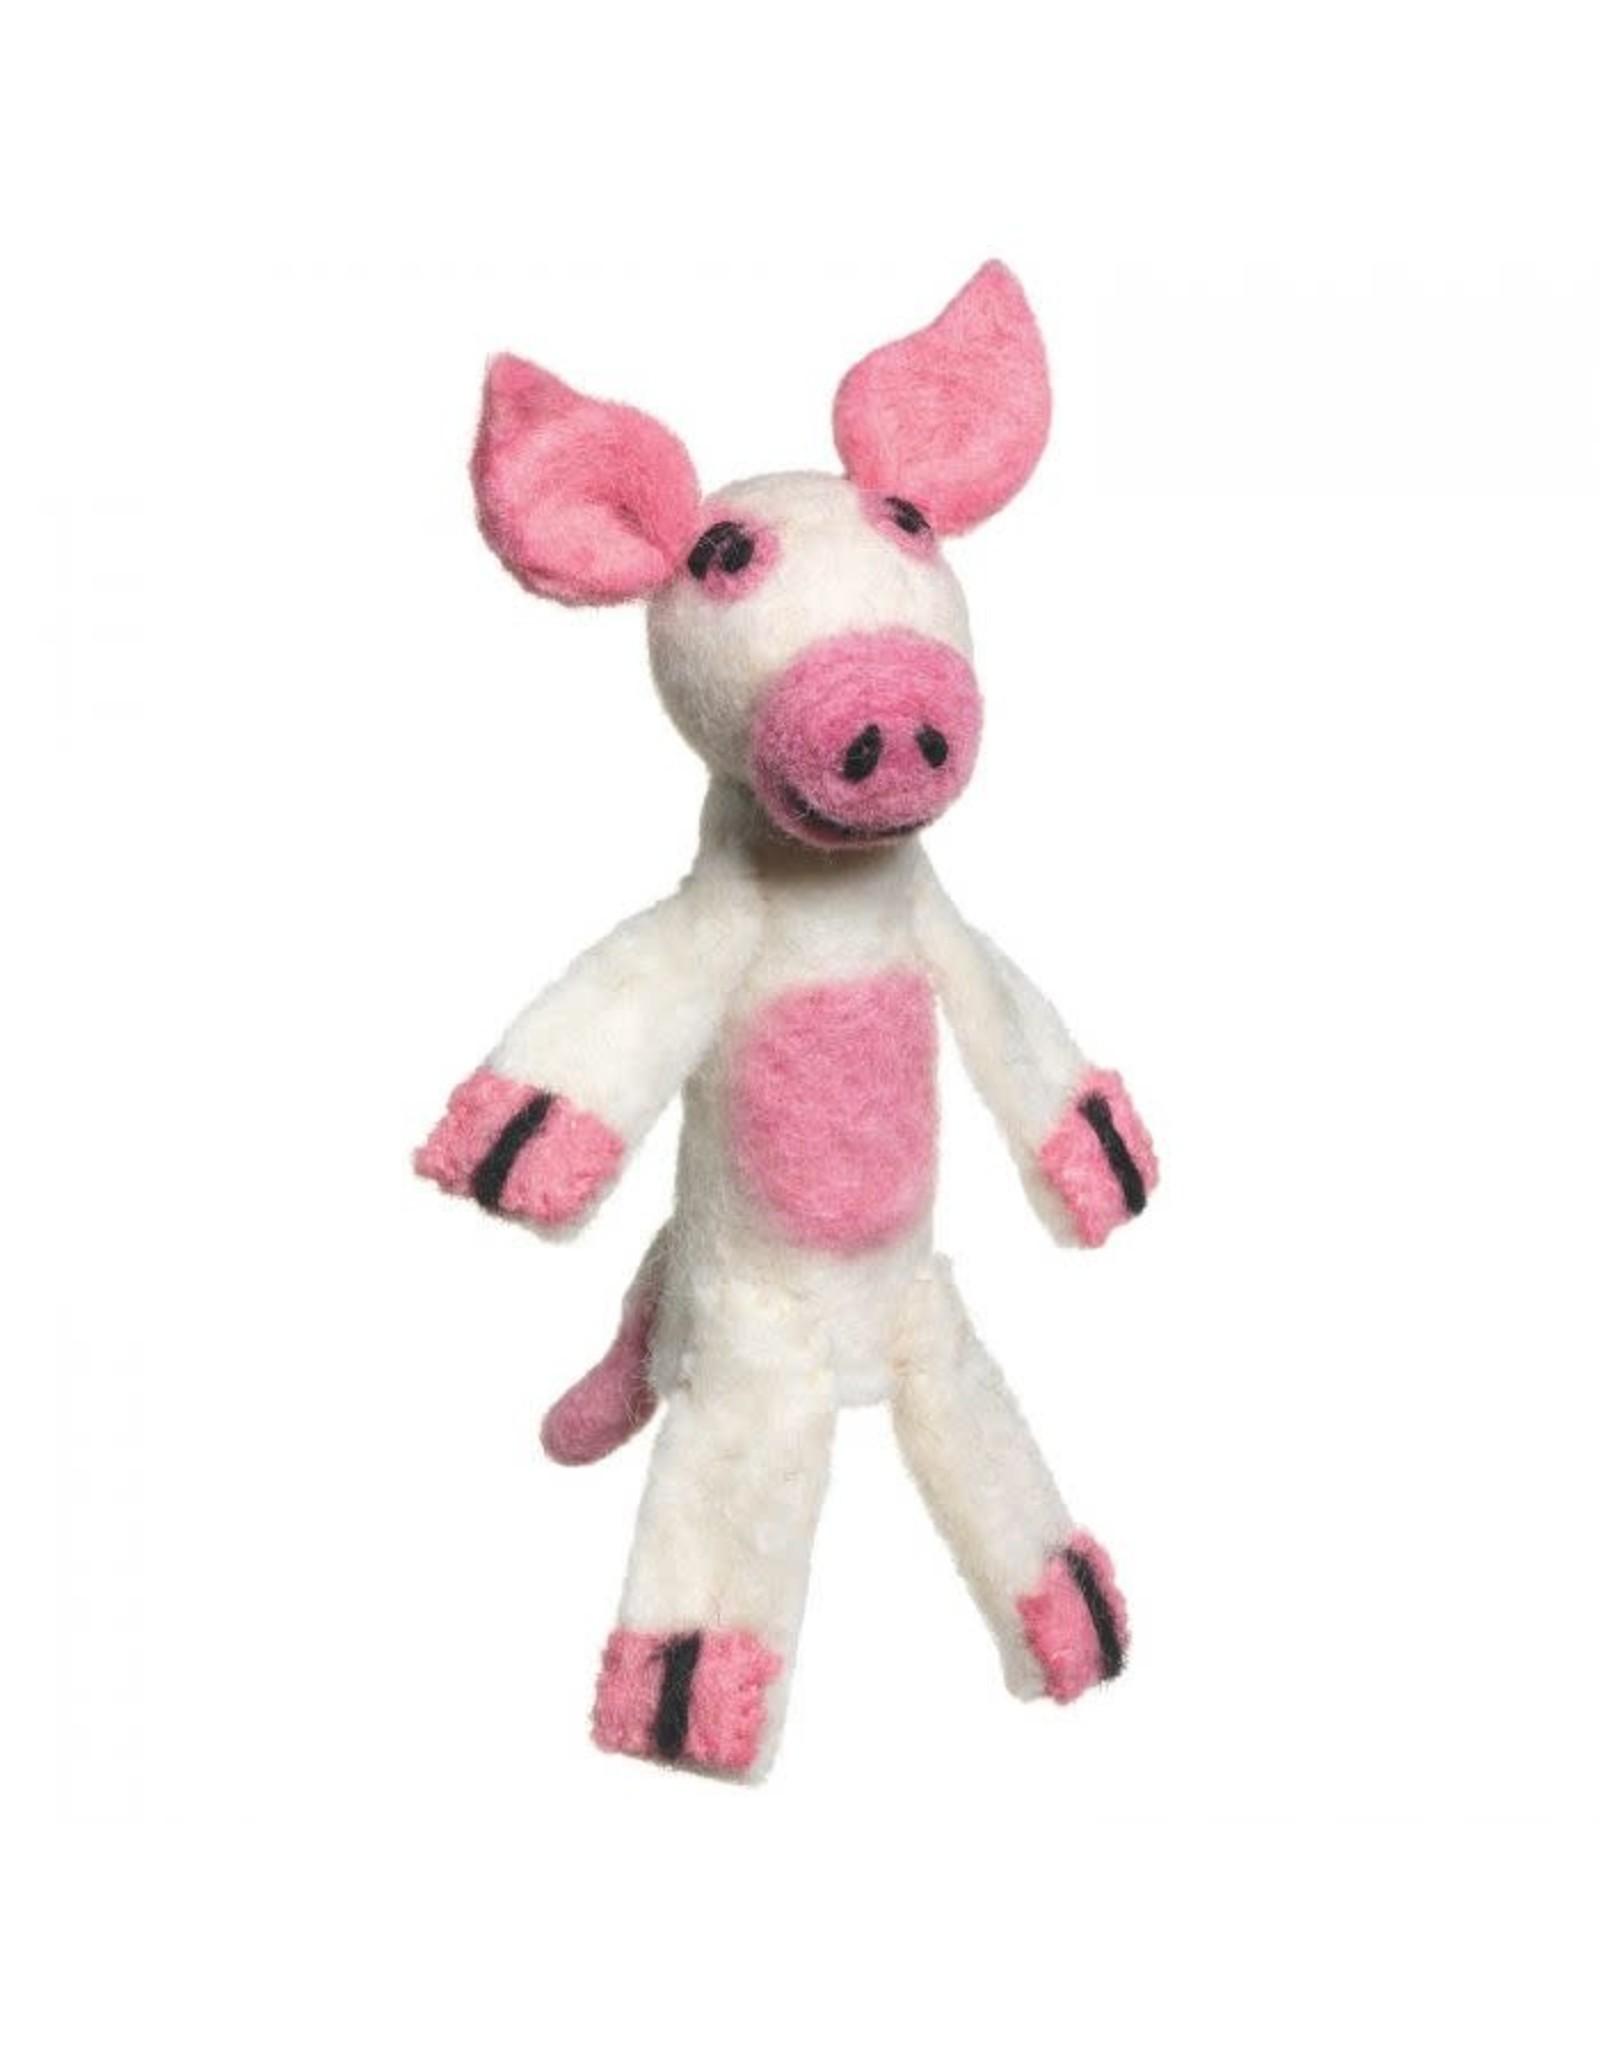 Pig Finger Puppet, Nepal